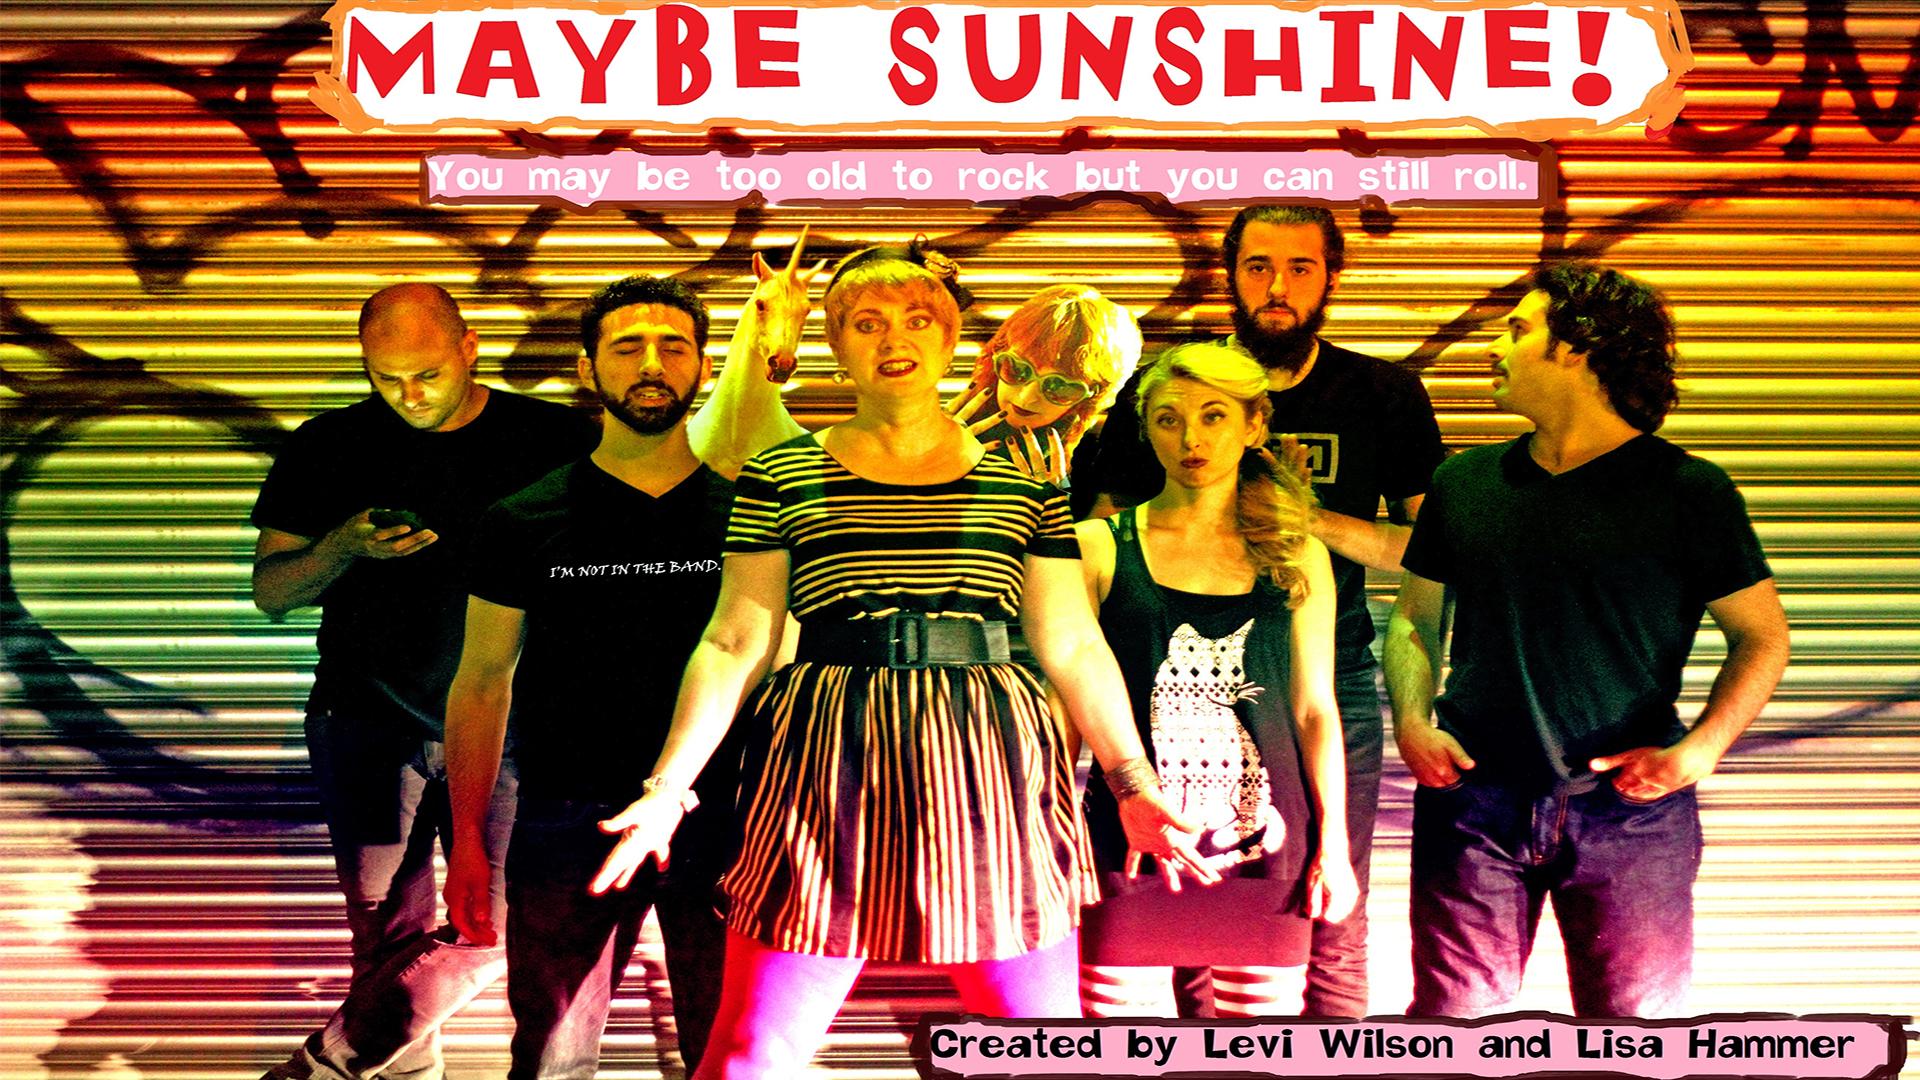 Maybe Sunshine